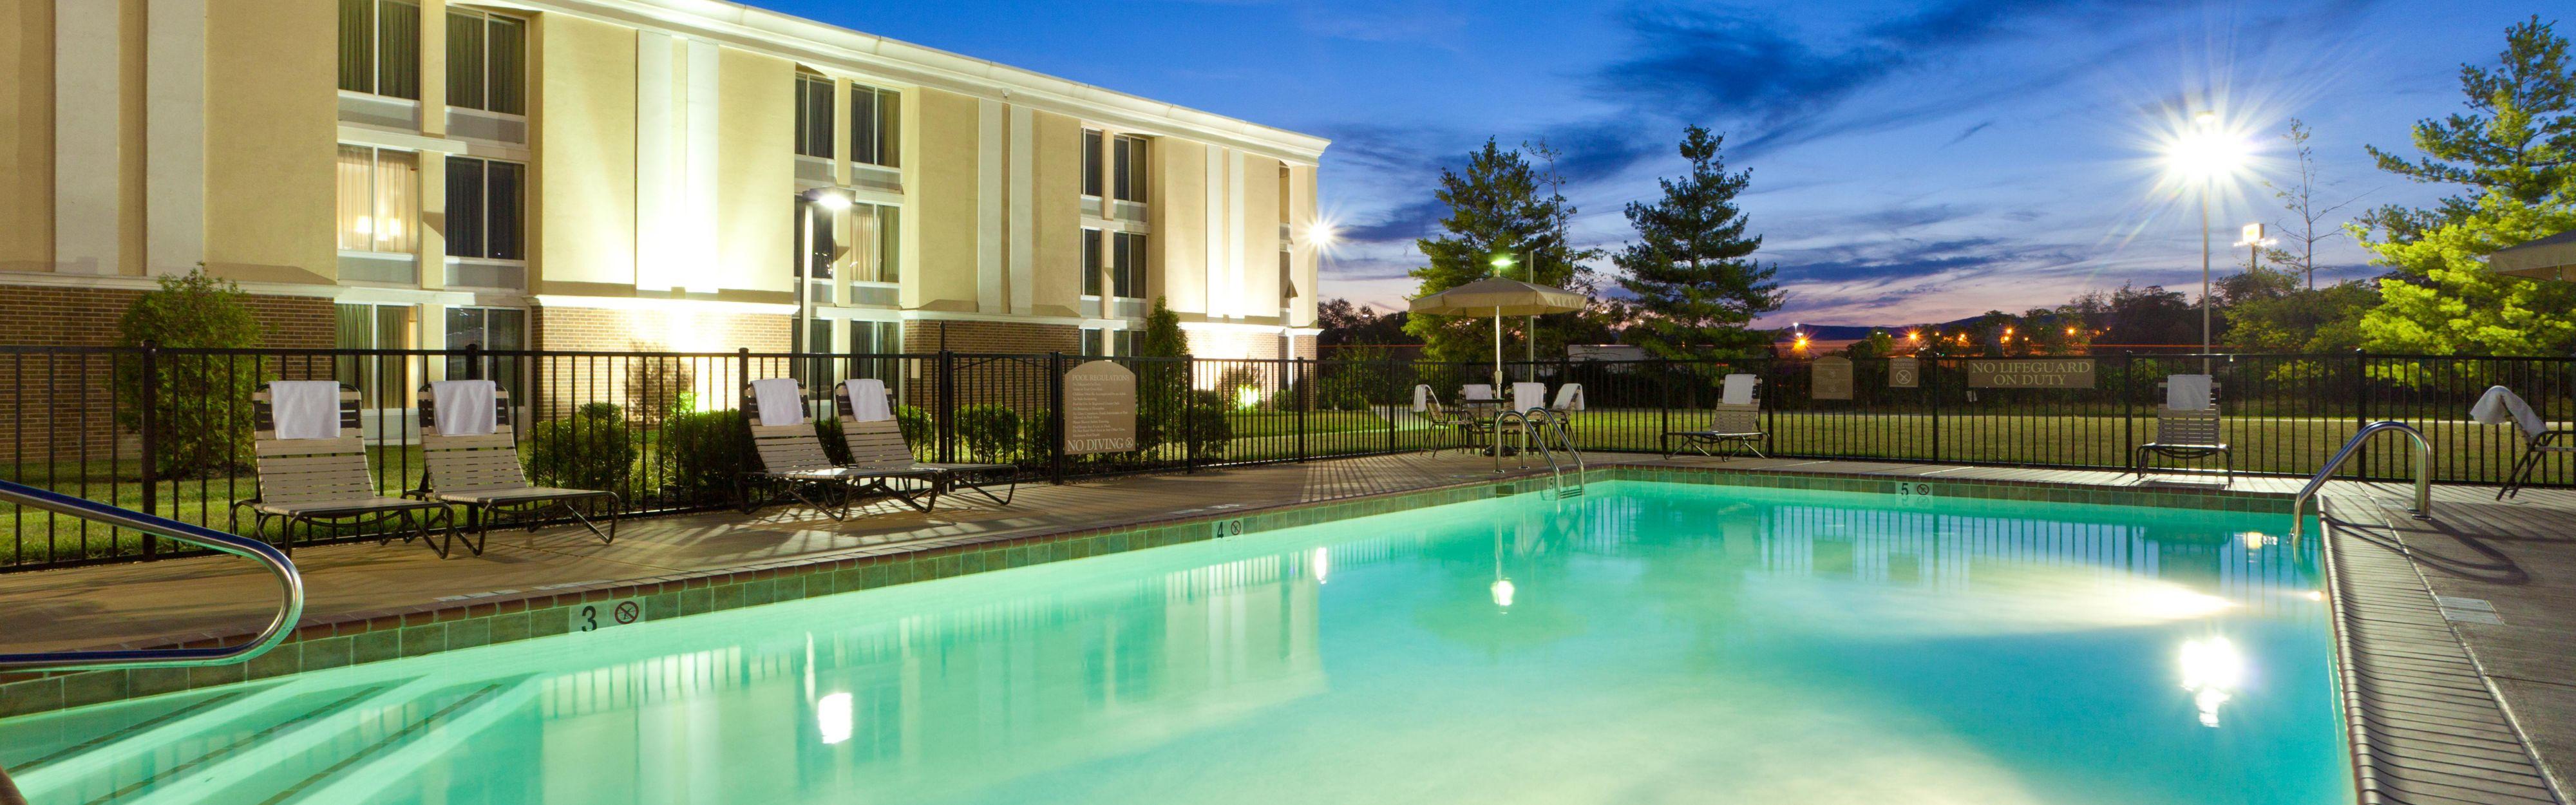 Hotels Near Woodstock Va